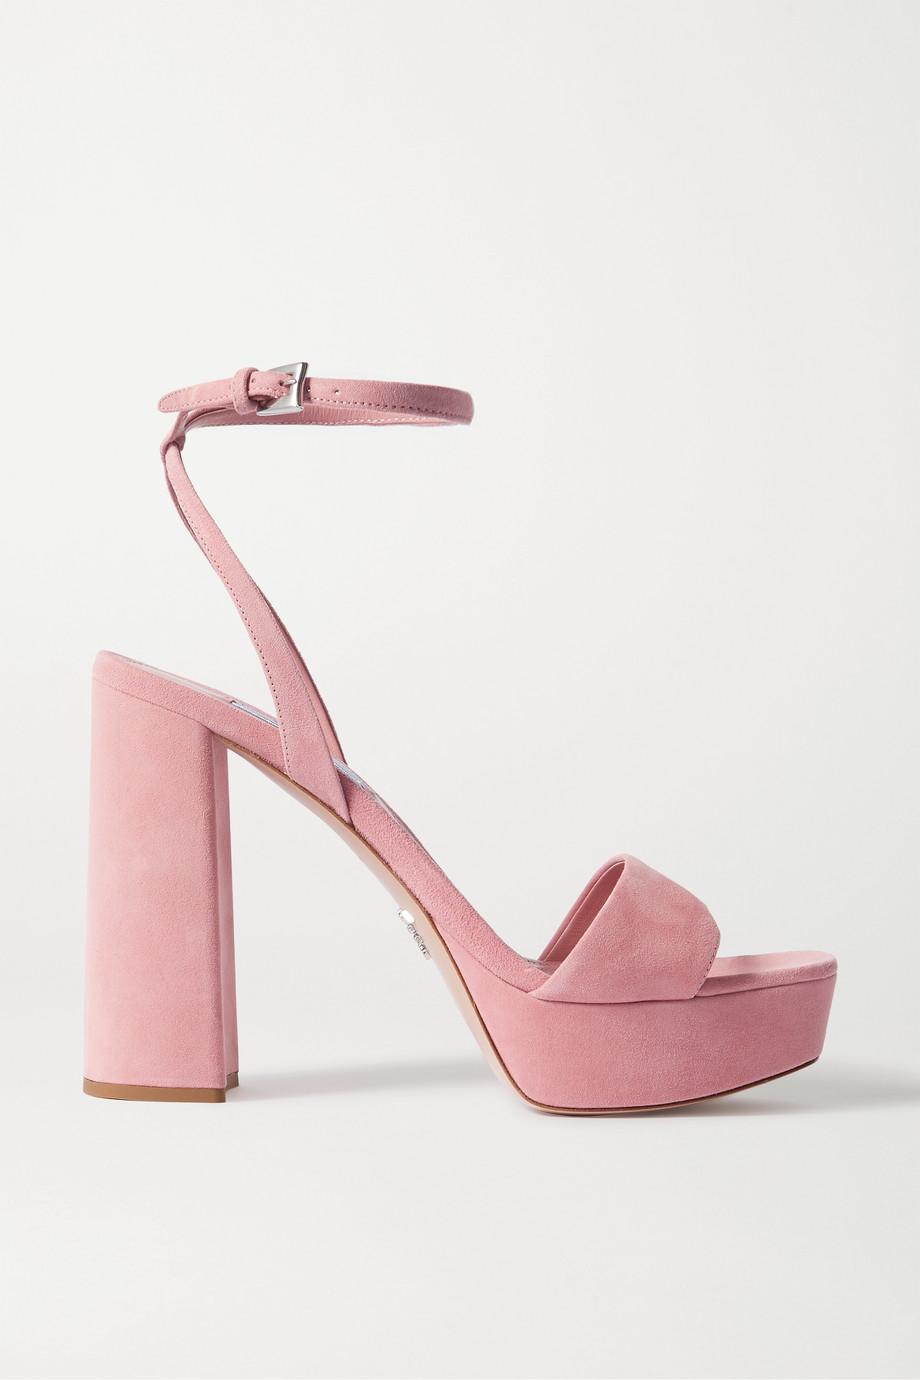 Prada 115 suede platform sandals